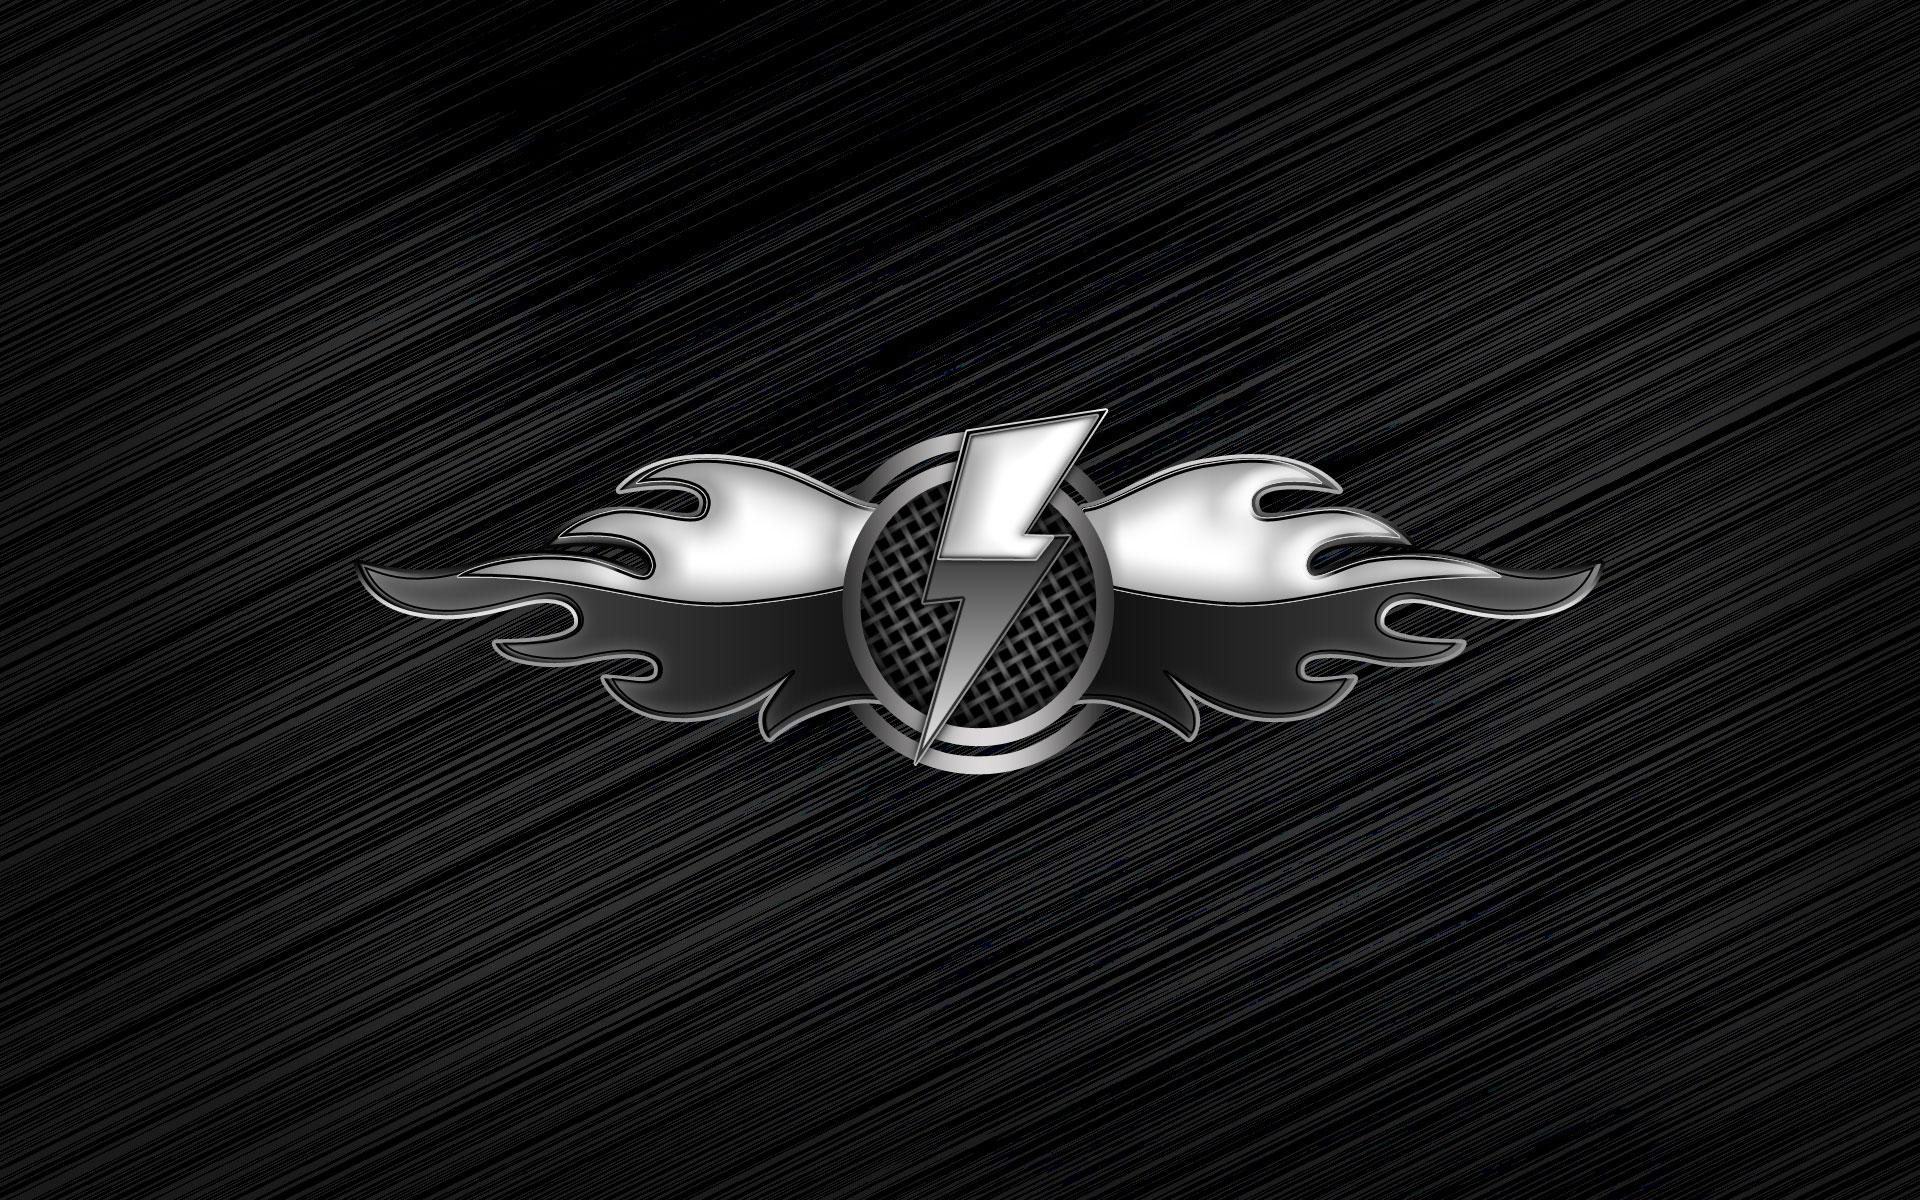 http://www.adobetutorialz.com/content_images/AdobePhotoshop/ART-D/tutorial497/metallic-emblem-with-flames.jpg